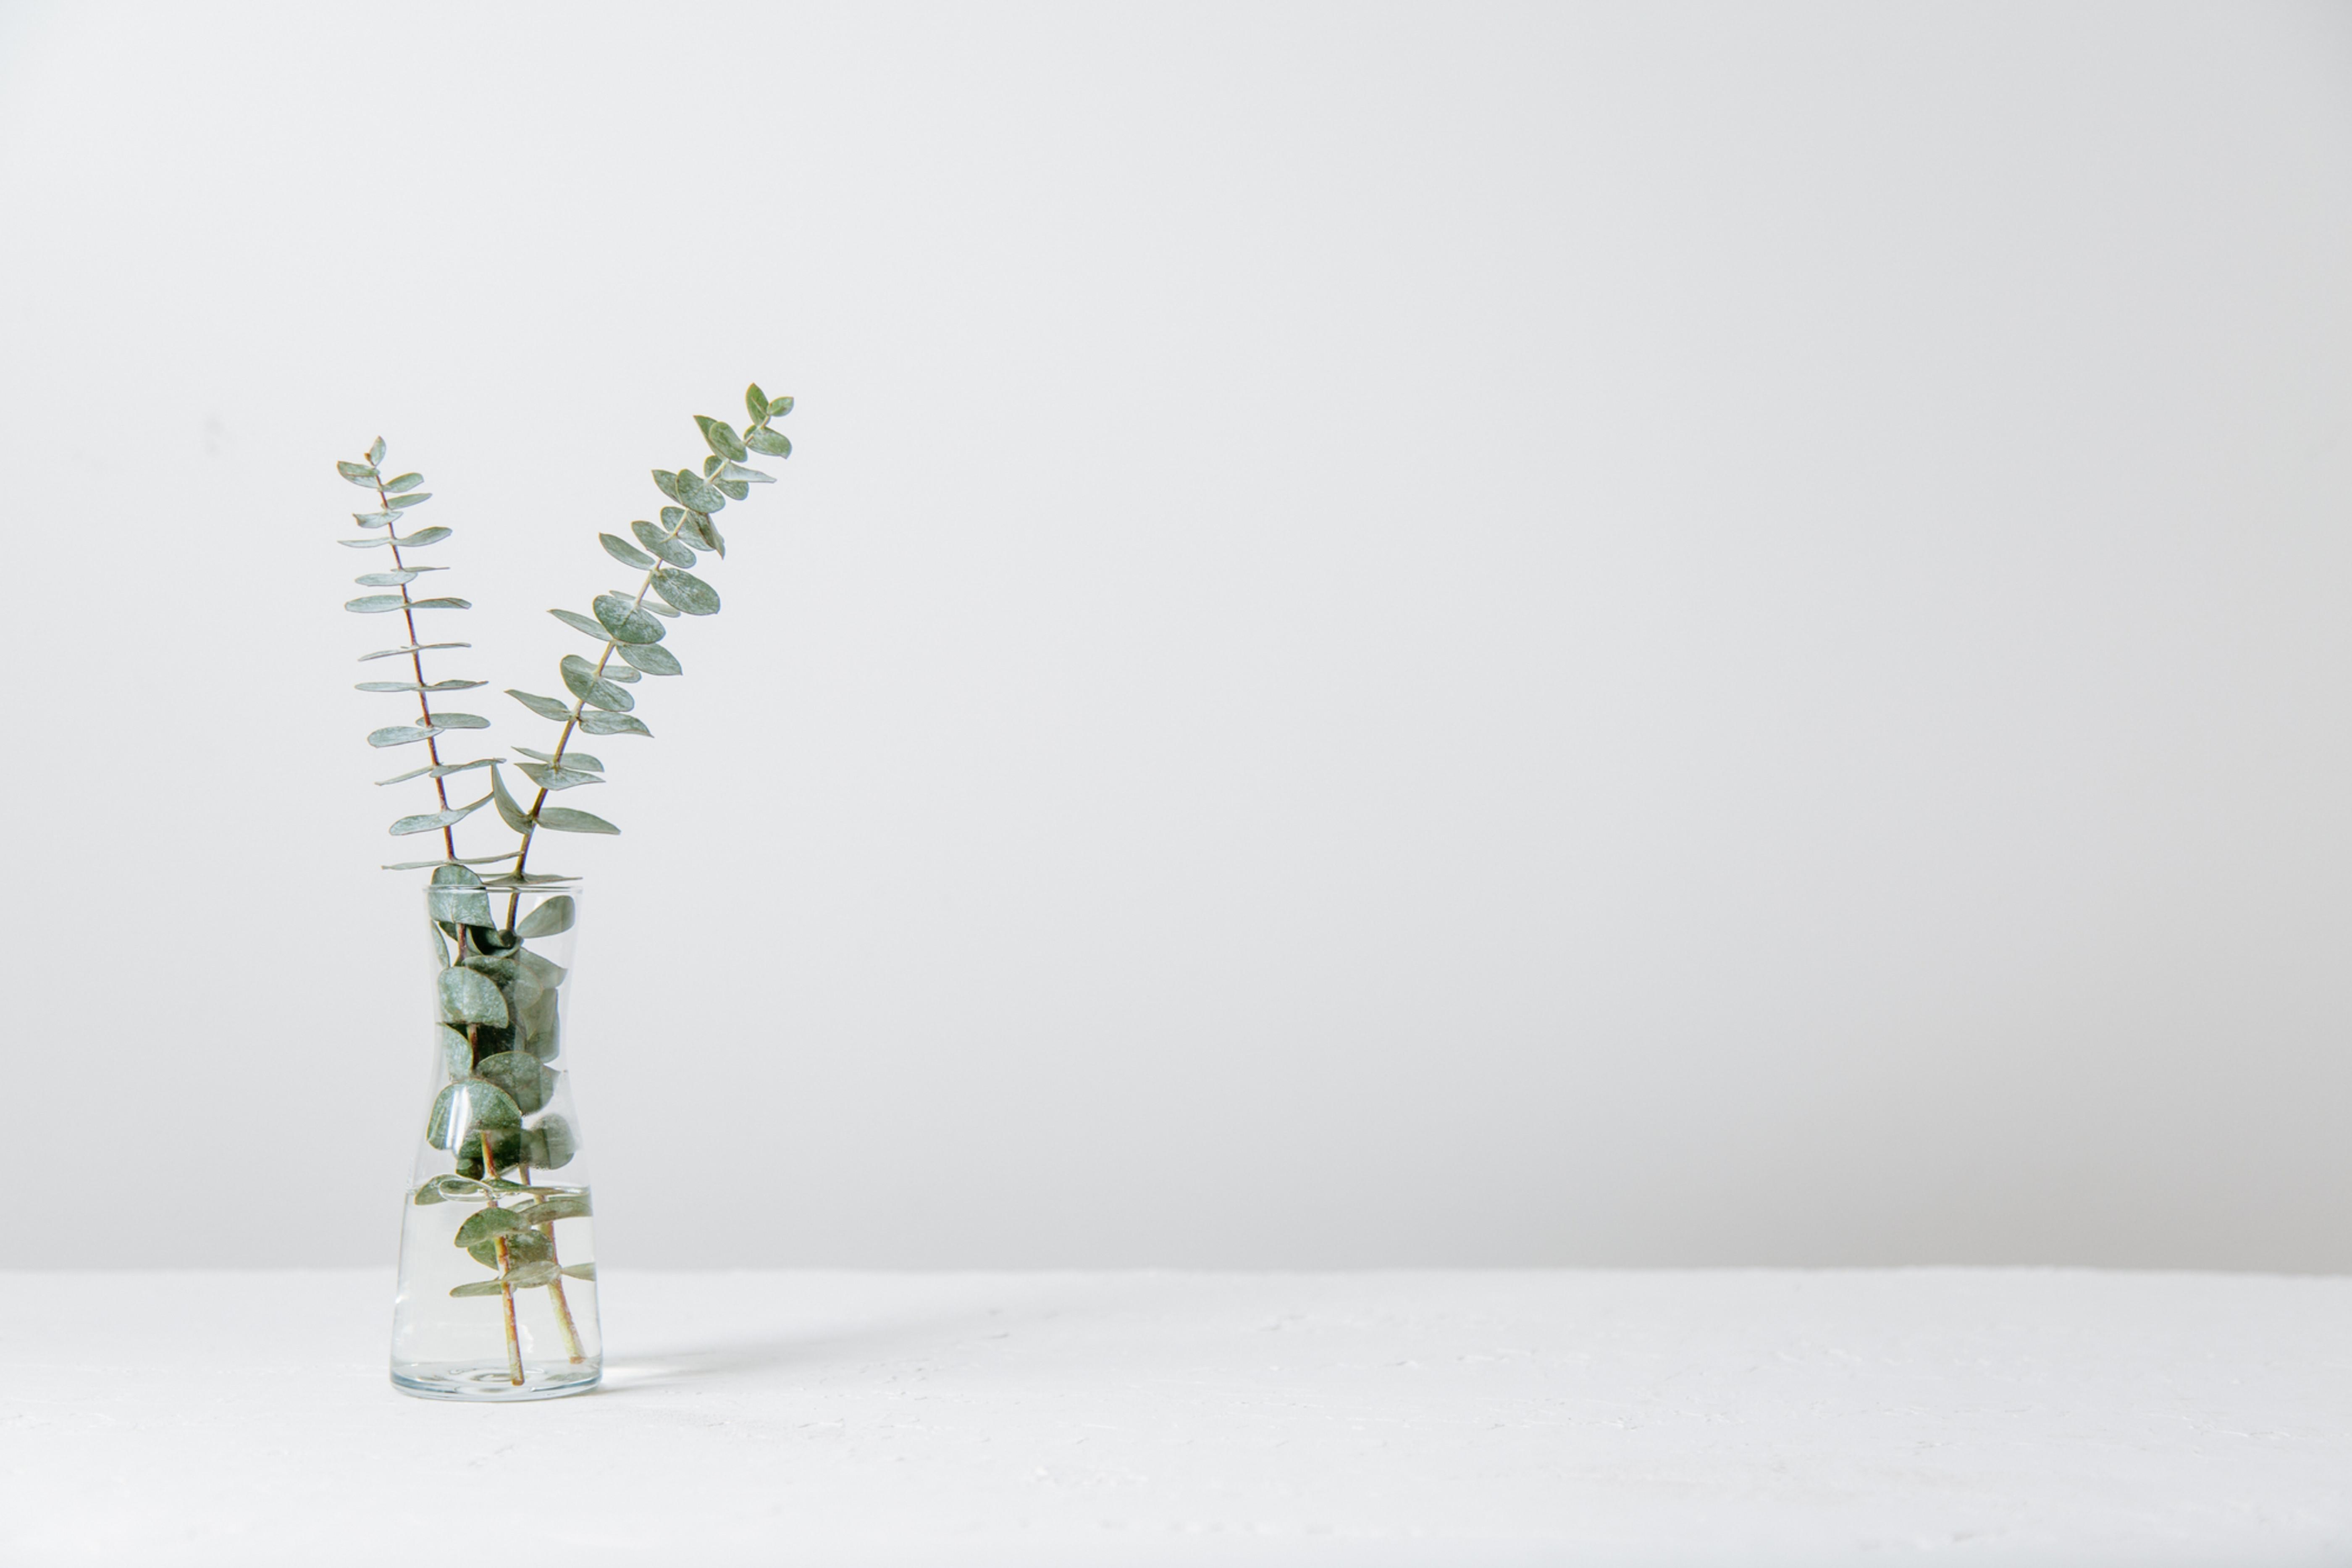 DTL: Vulnerability in Leadership